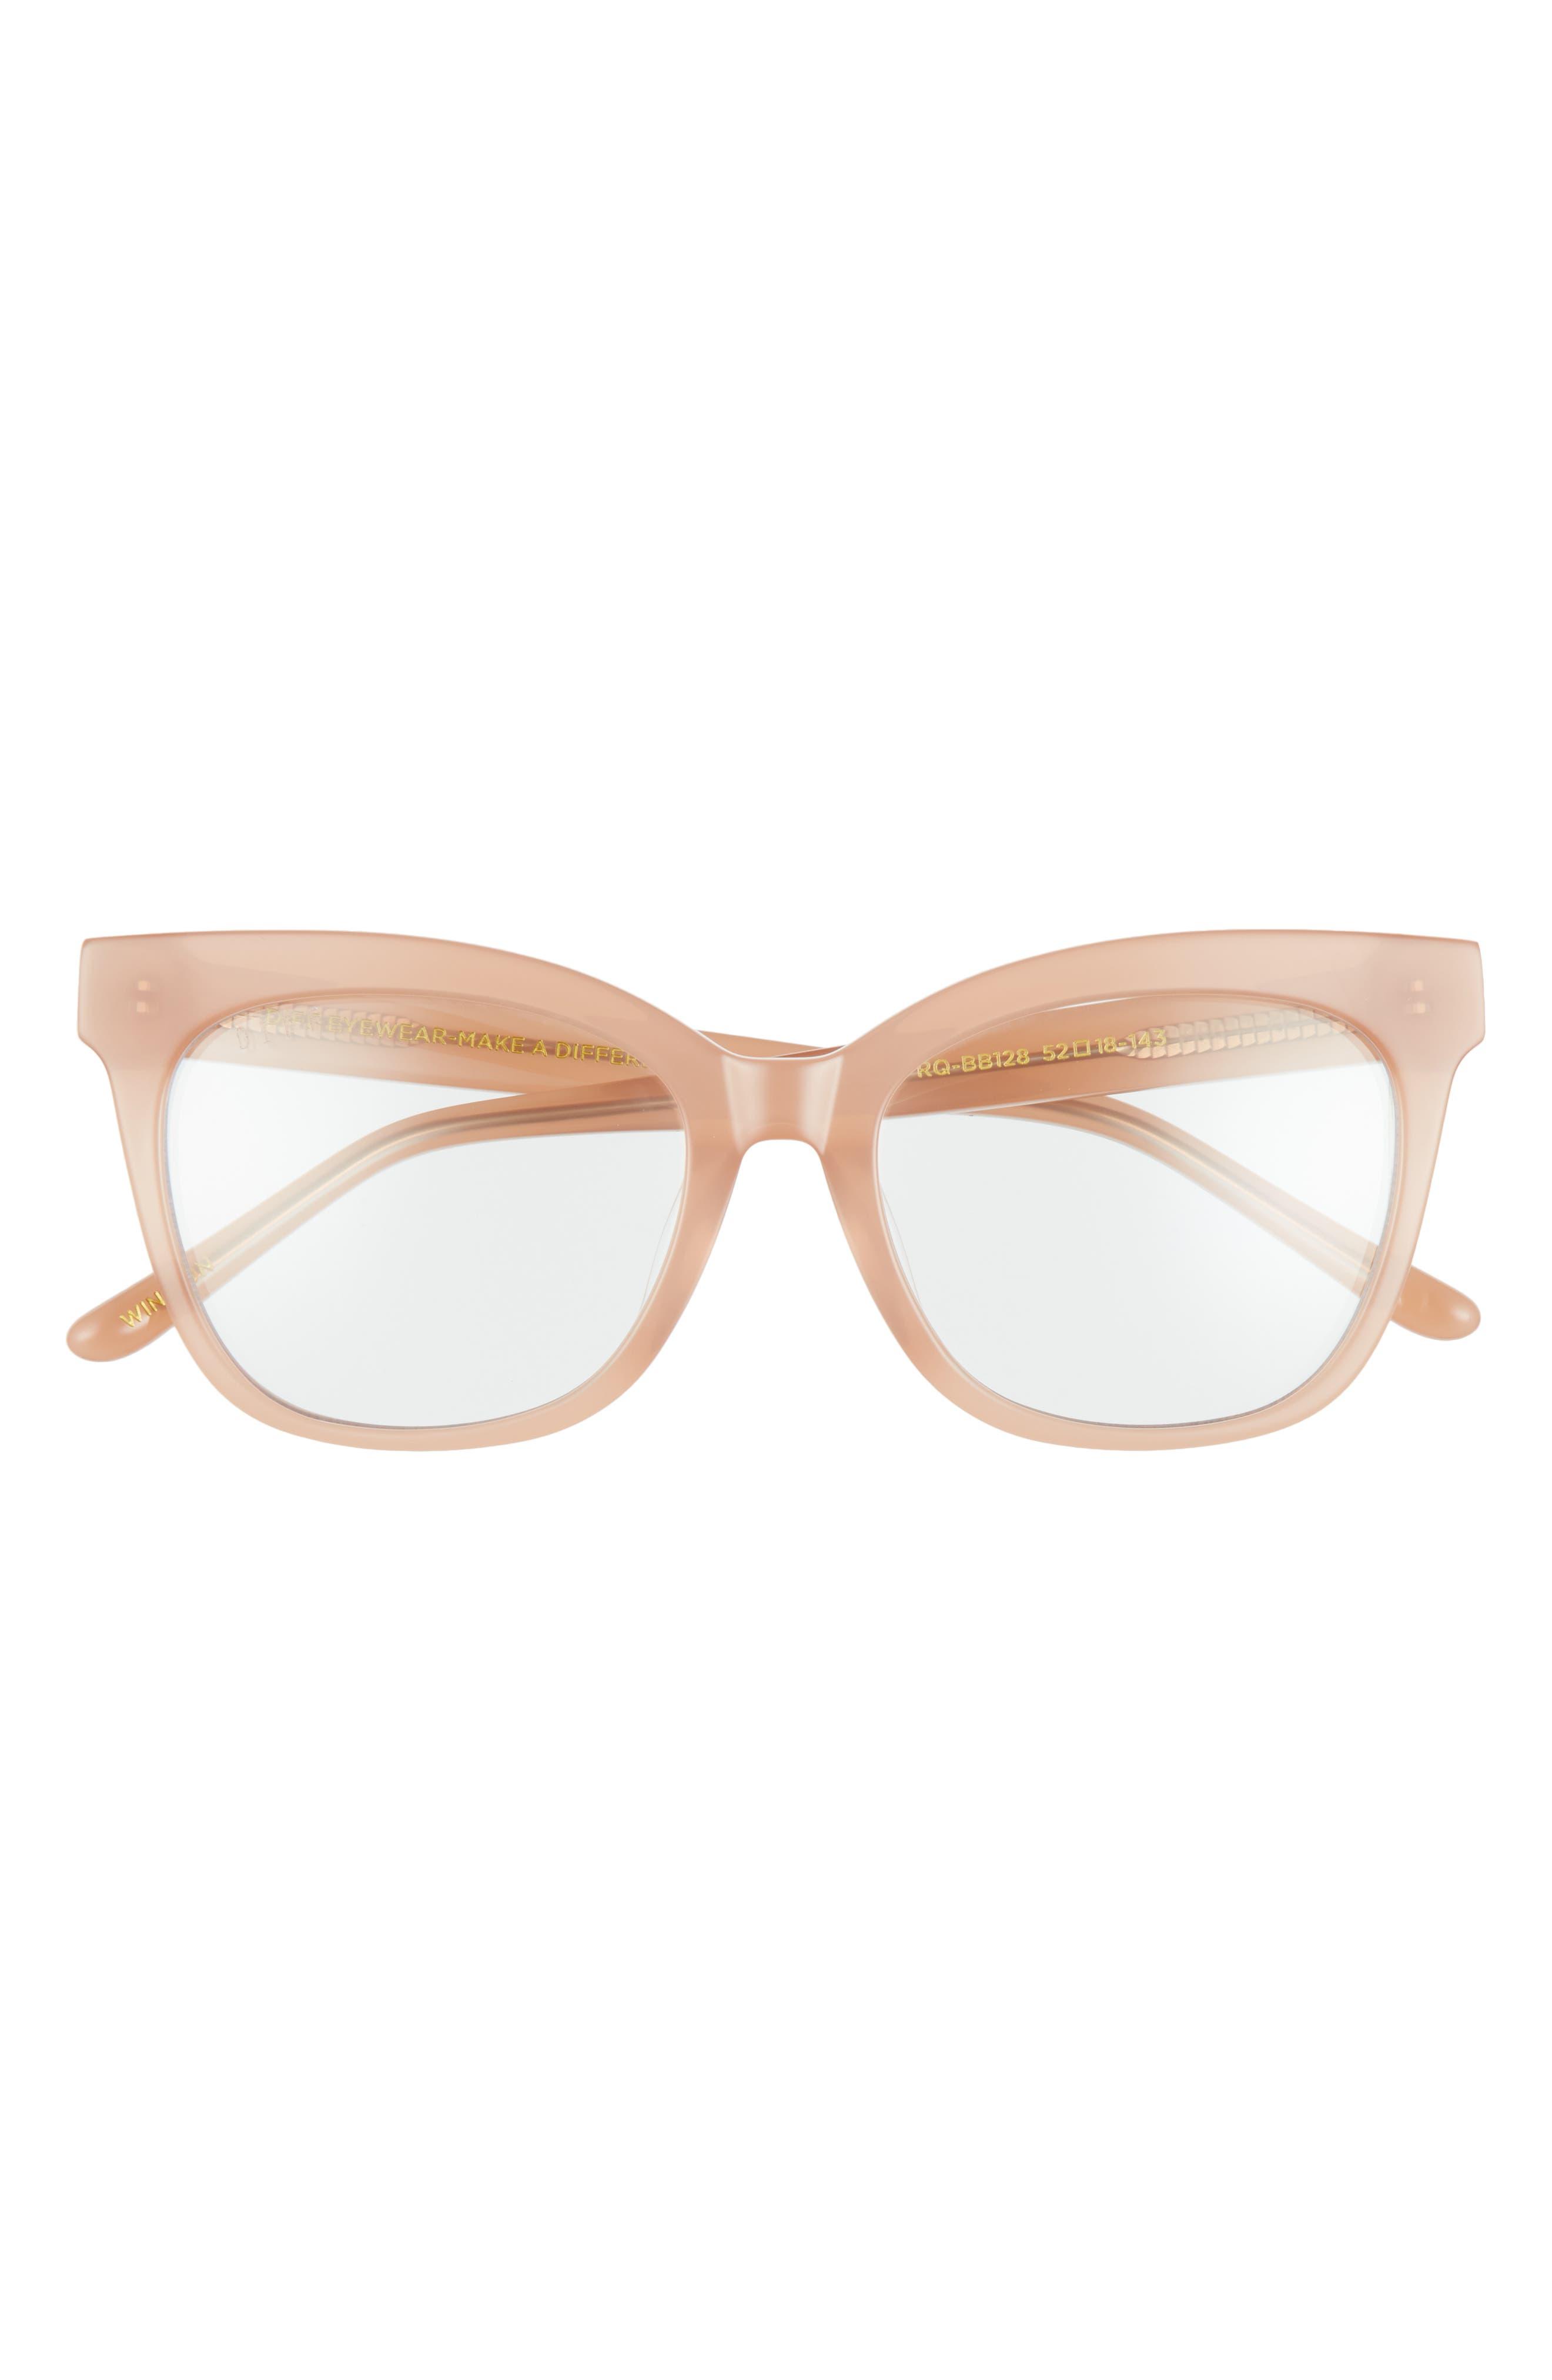 Winston 52mm Blue Light Blocking Glasses